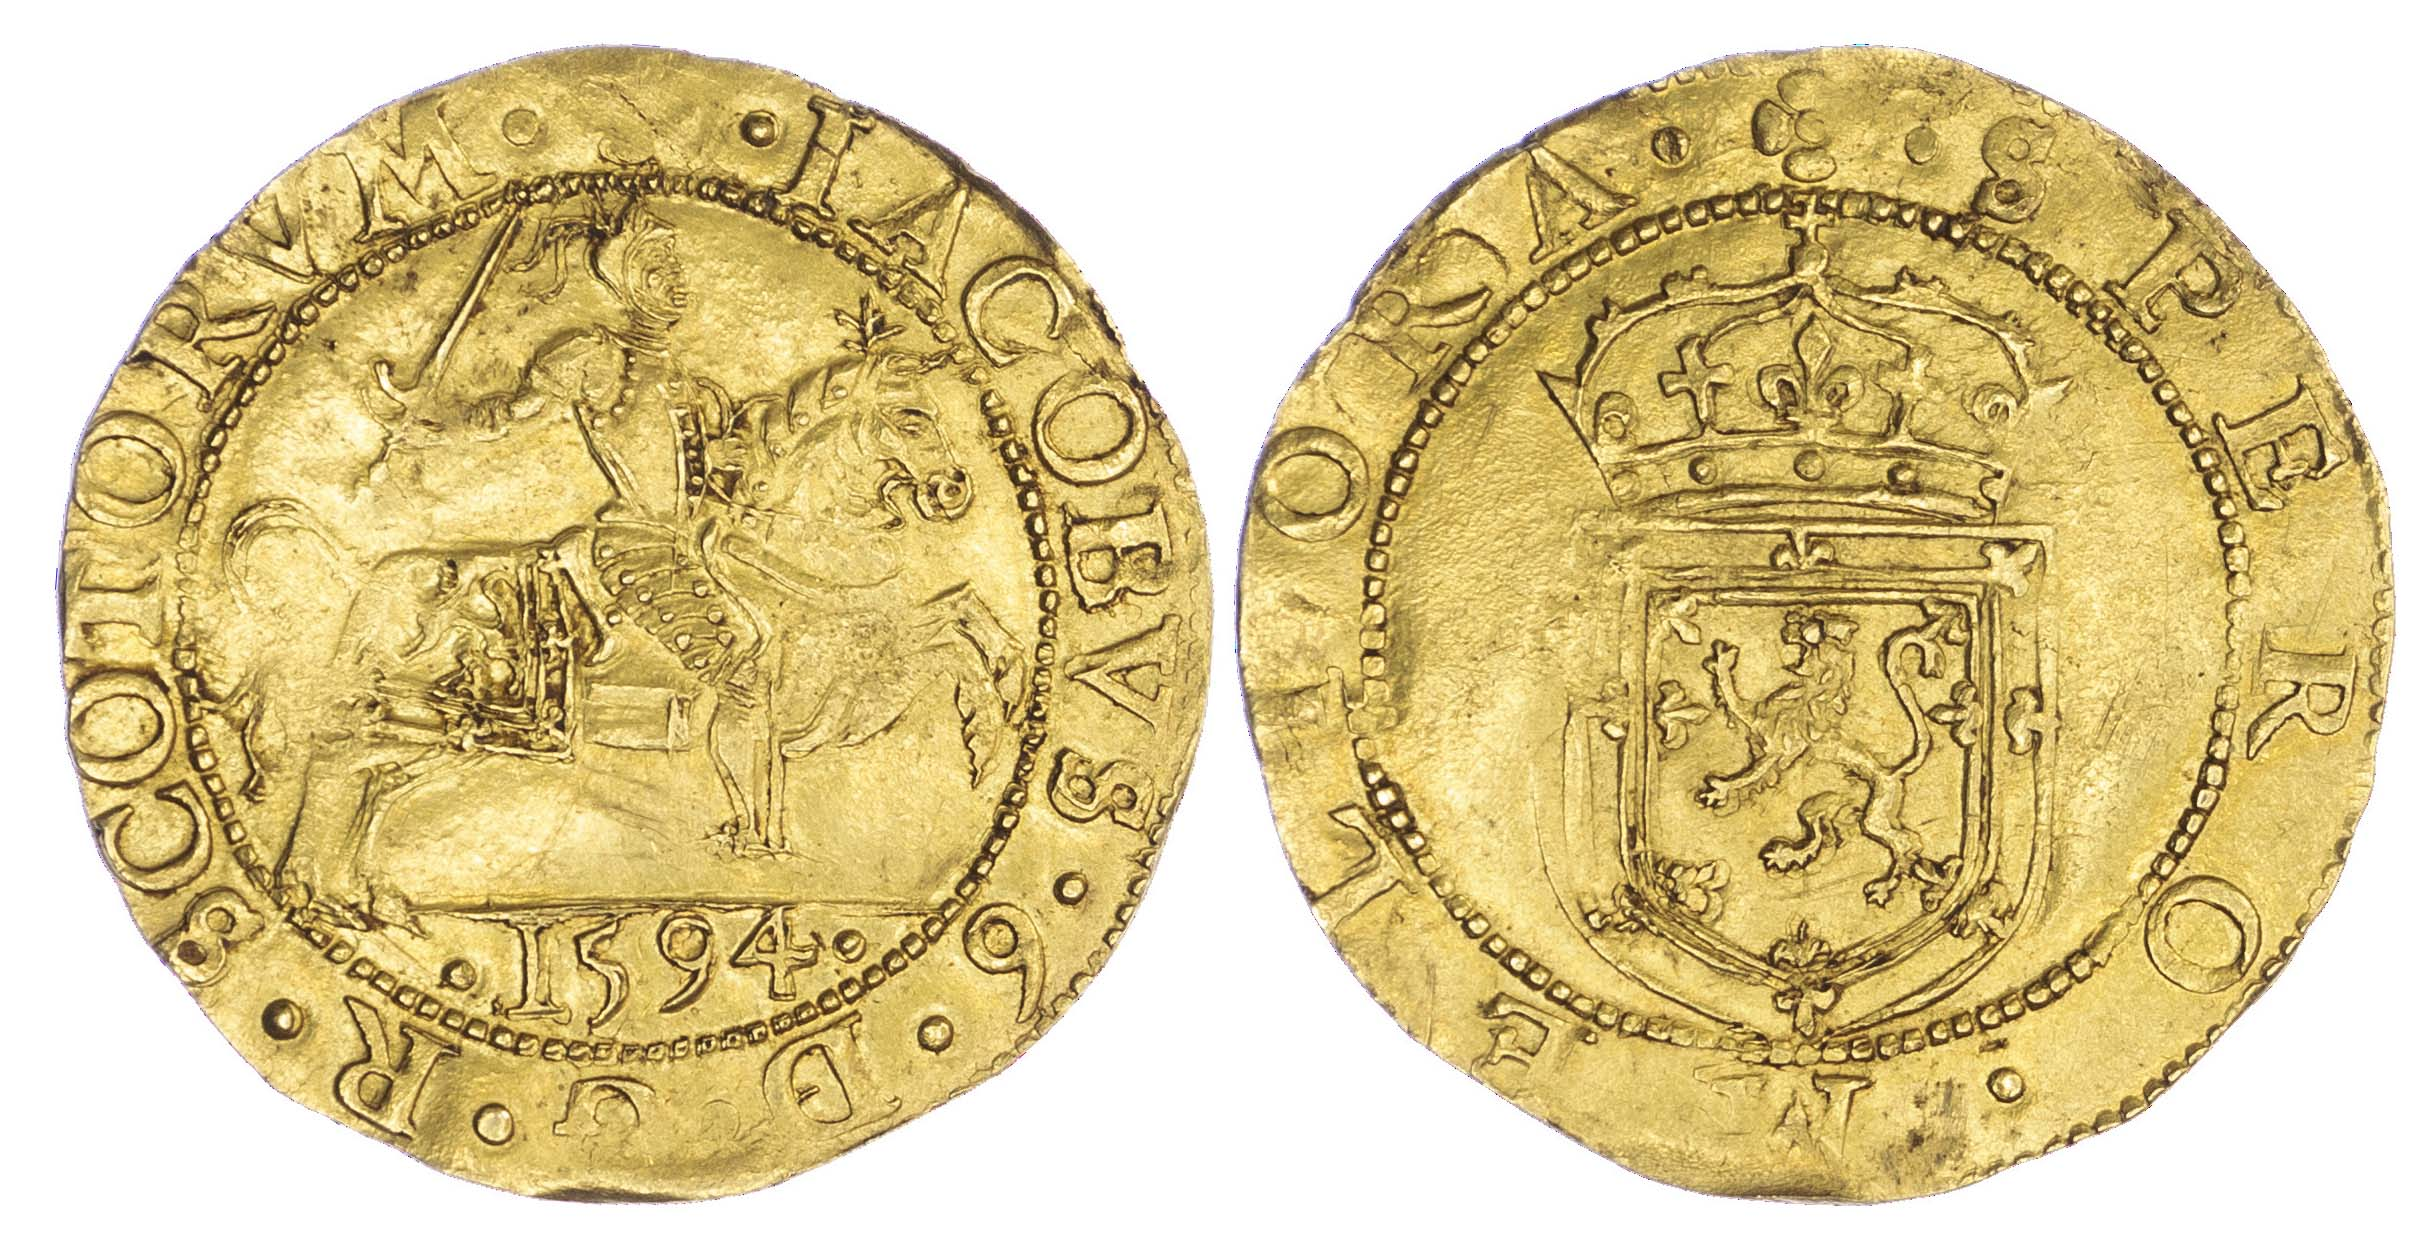 James VI (1567-1625), gold Rider of 100 Shillings, 1594